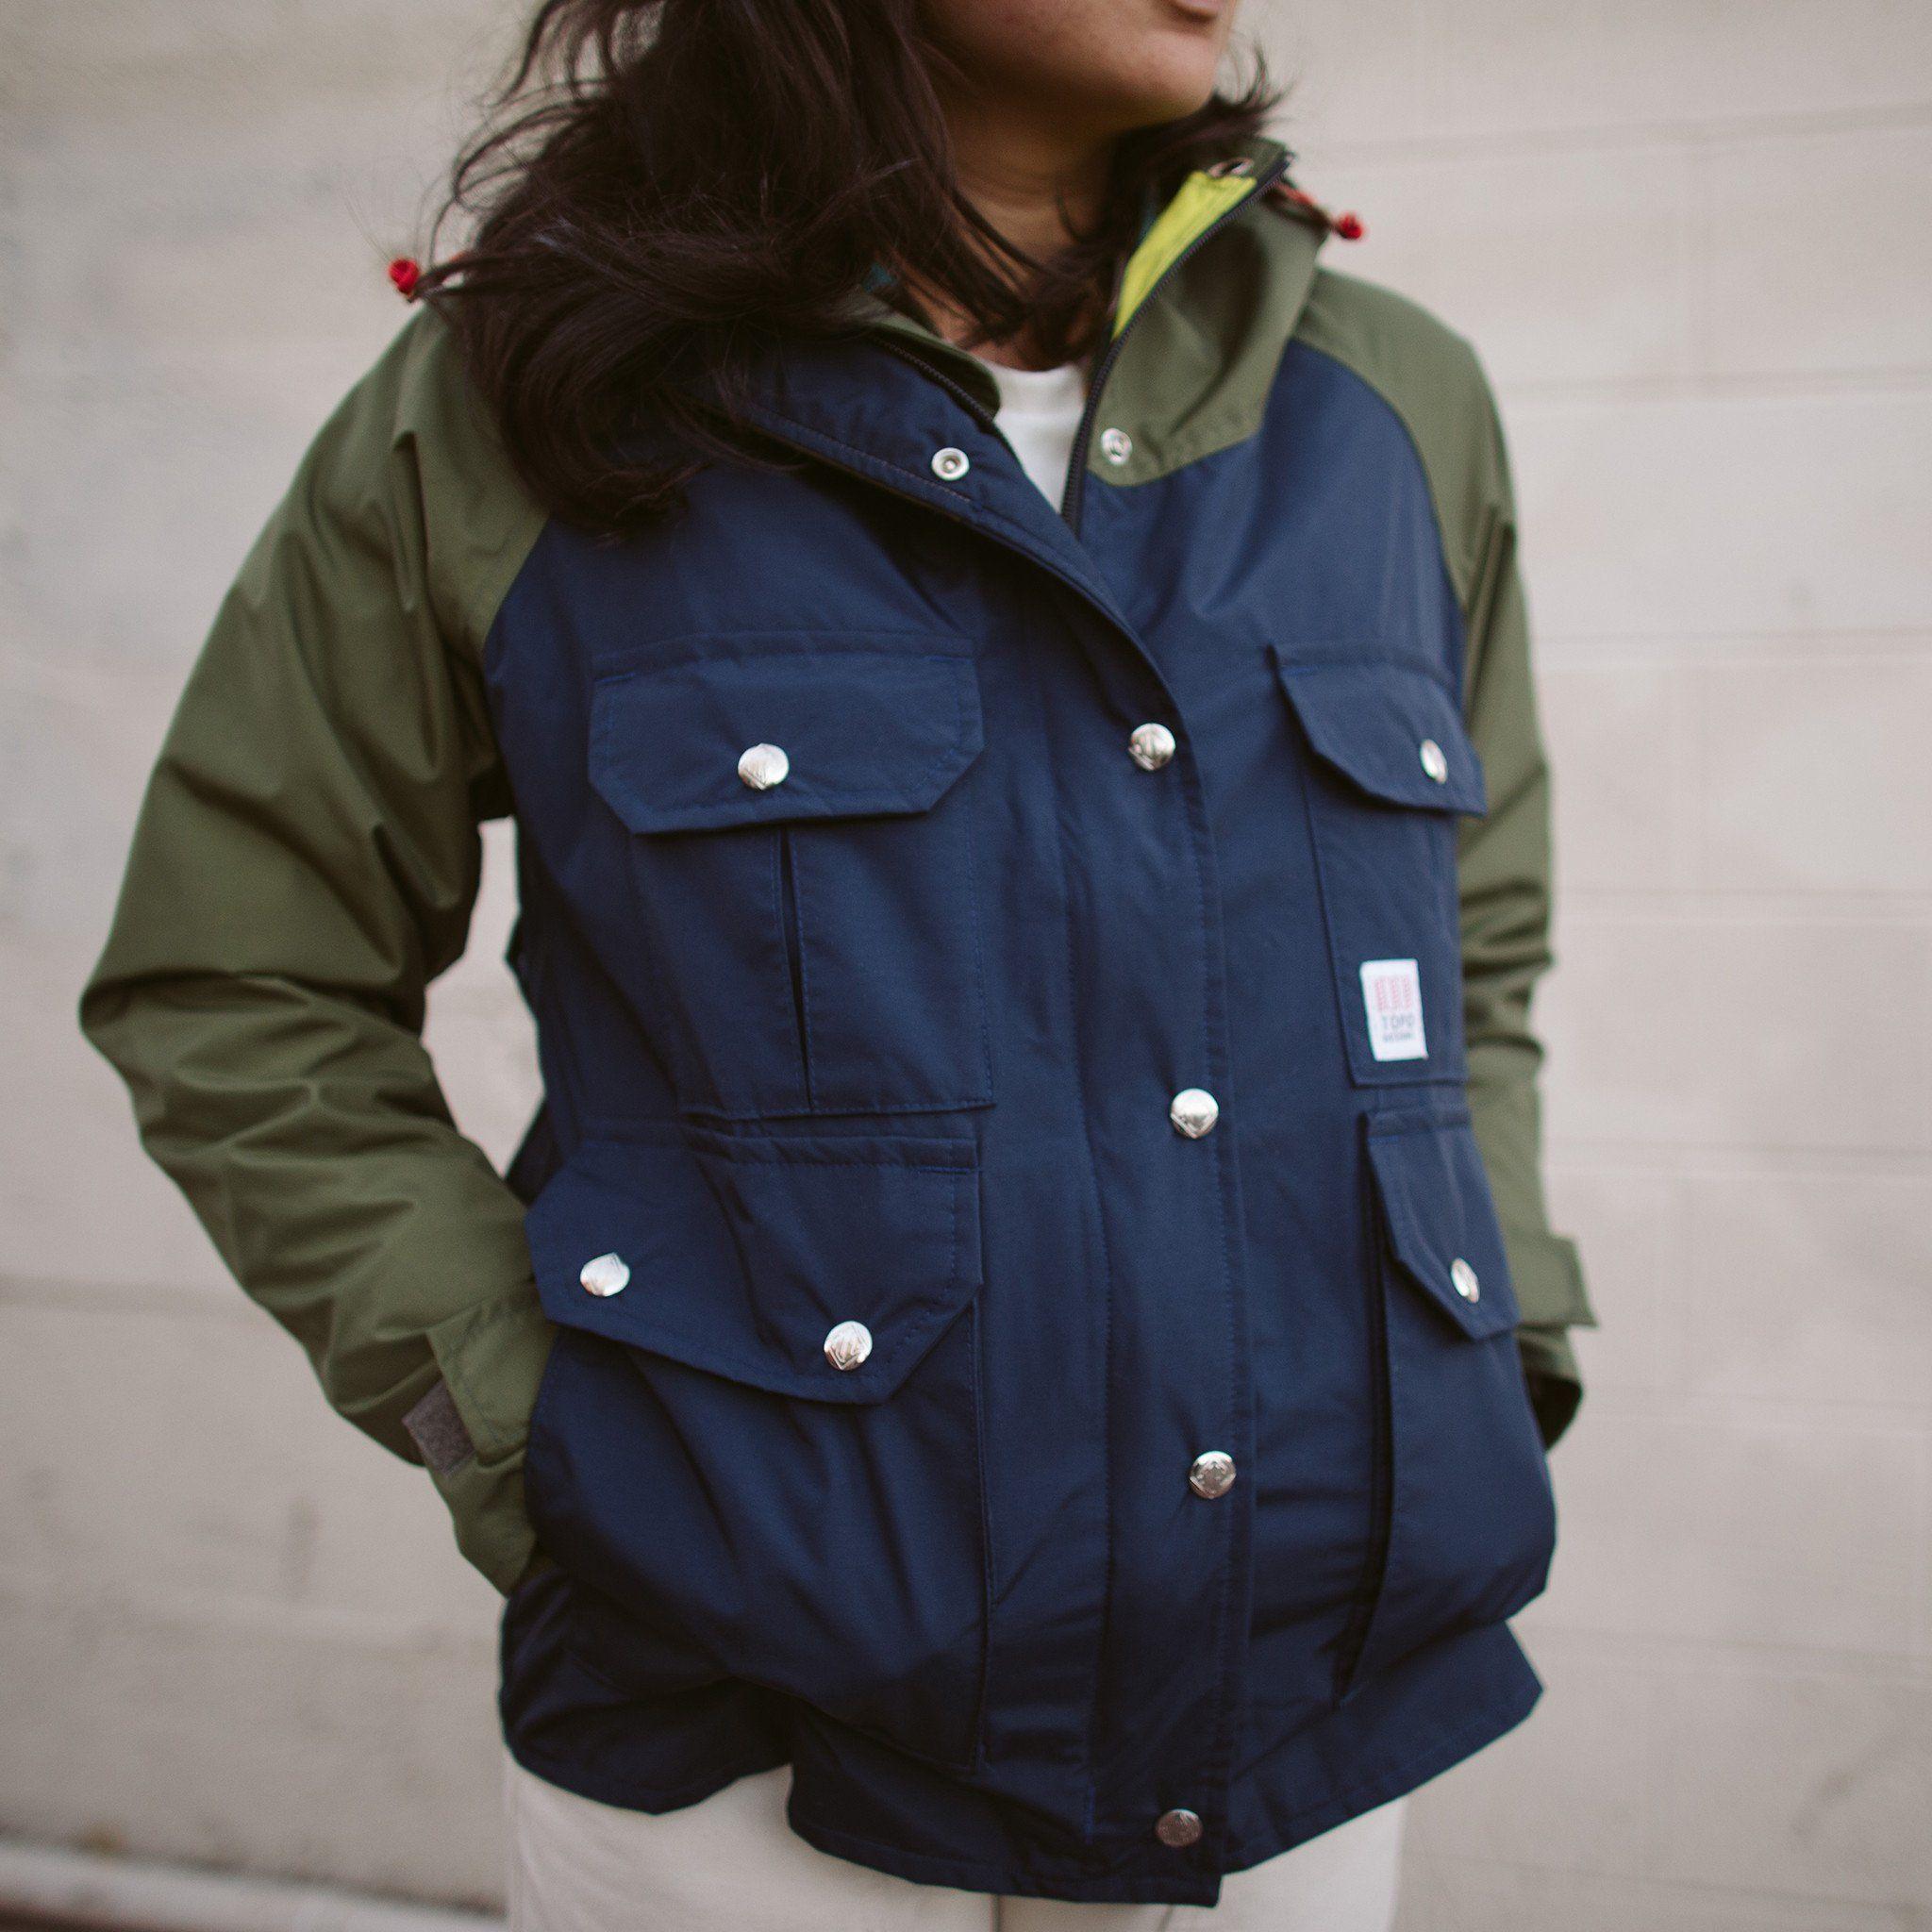 Women S Mountain Jacket Http Topodesigns Com Collections Topo Designs Womens Collection Products Womens Mountain J Topo Designs Women Mountain Jacket Jackets [ 2048 x 2048 Pixel ]